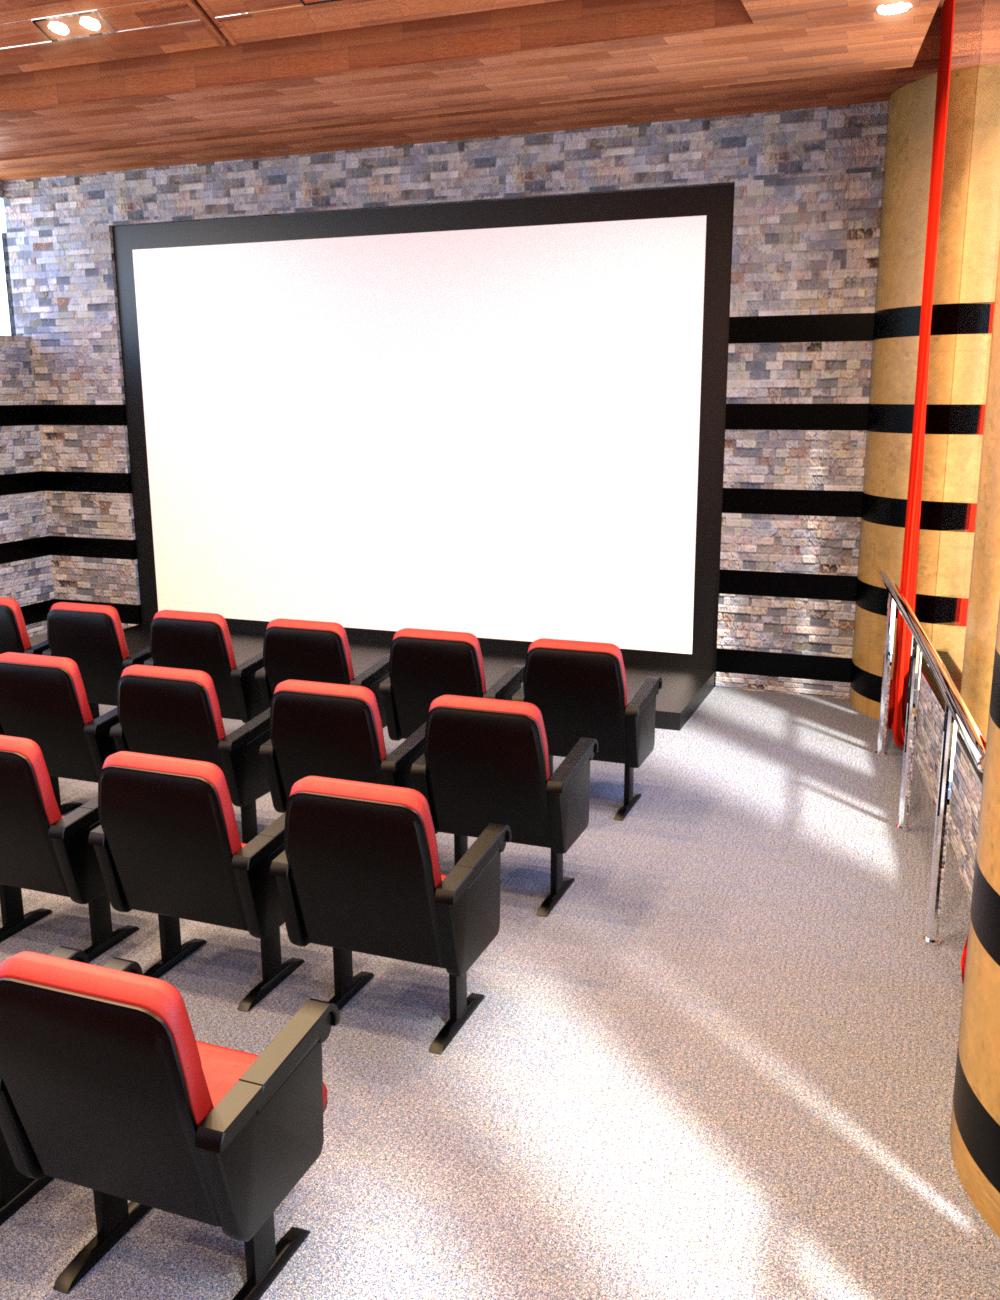 Presentation Room by: Tesla3dCorp, 3D Models by Daz 3D